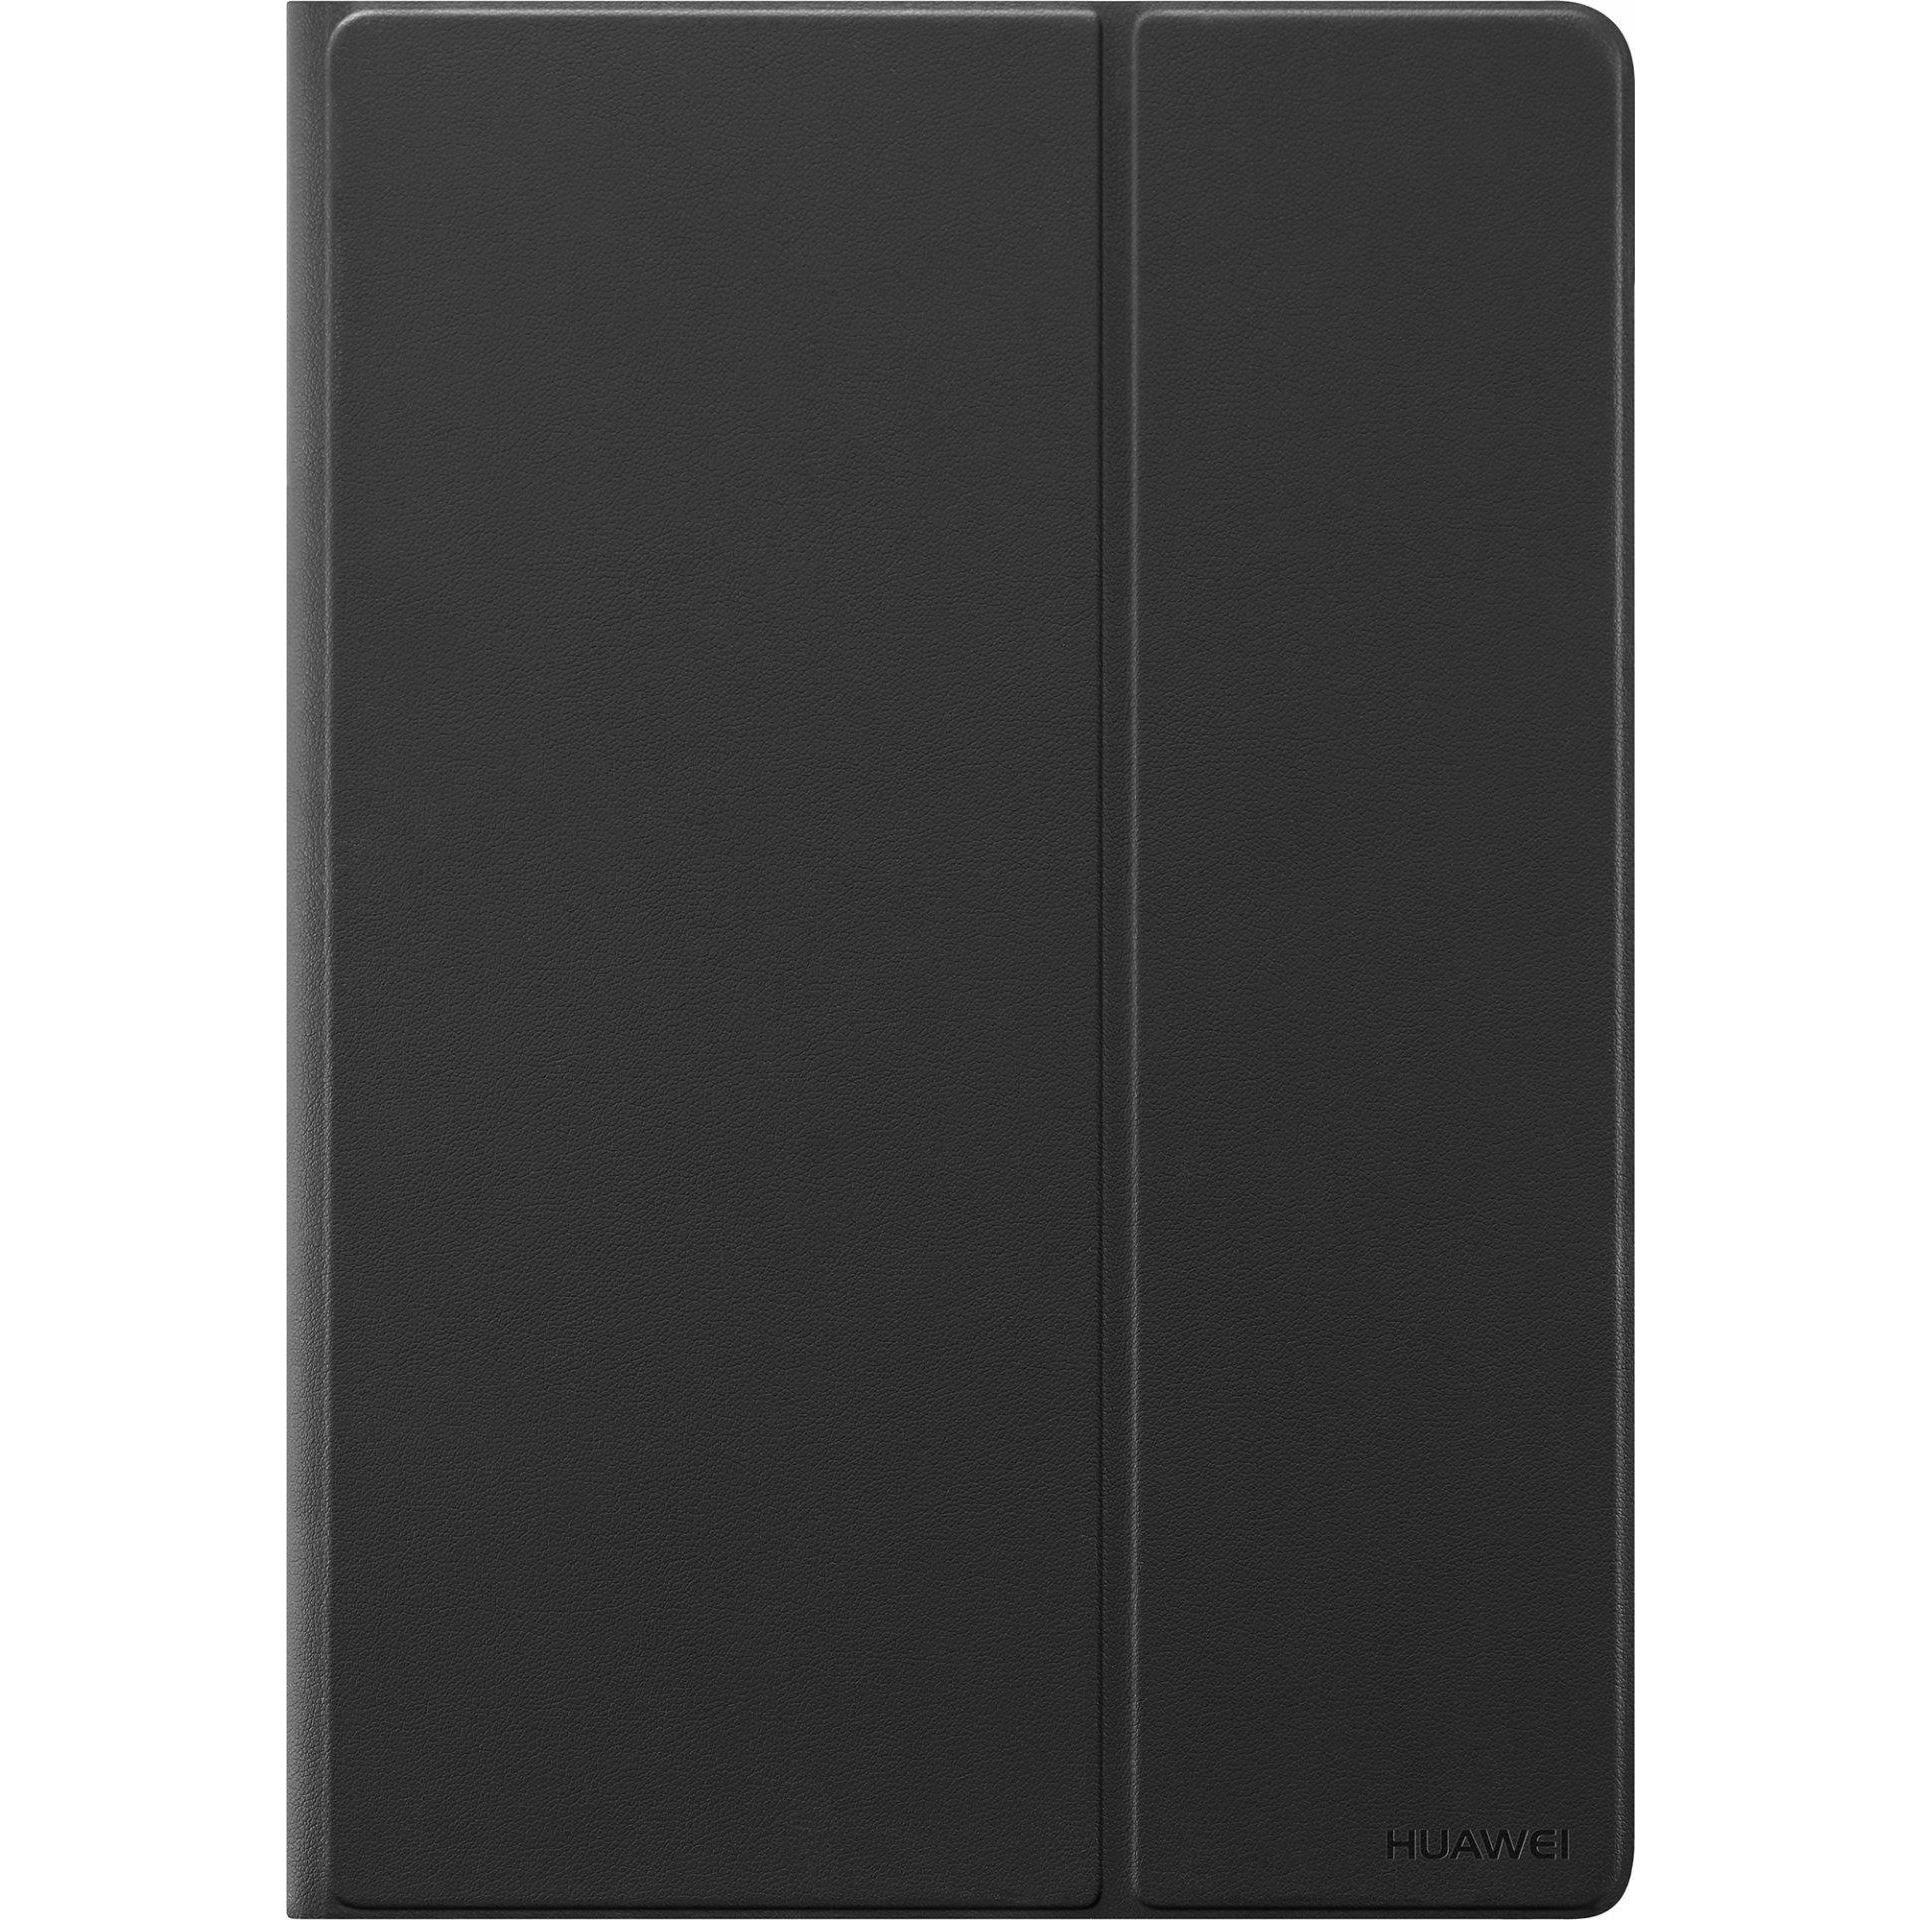 FLIP COVER T3 7.0, BLACK